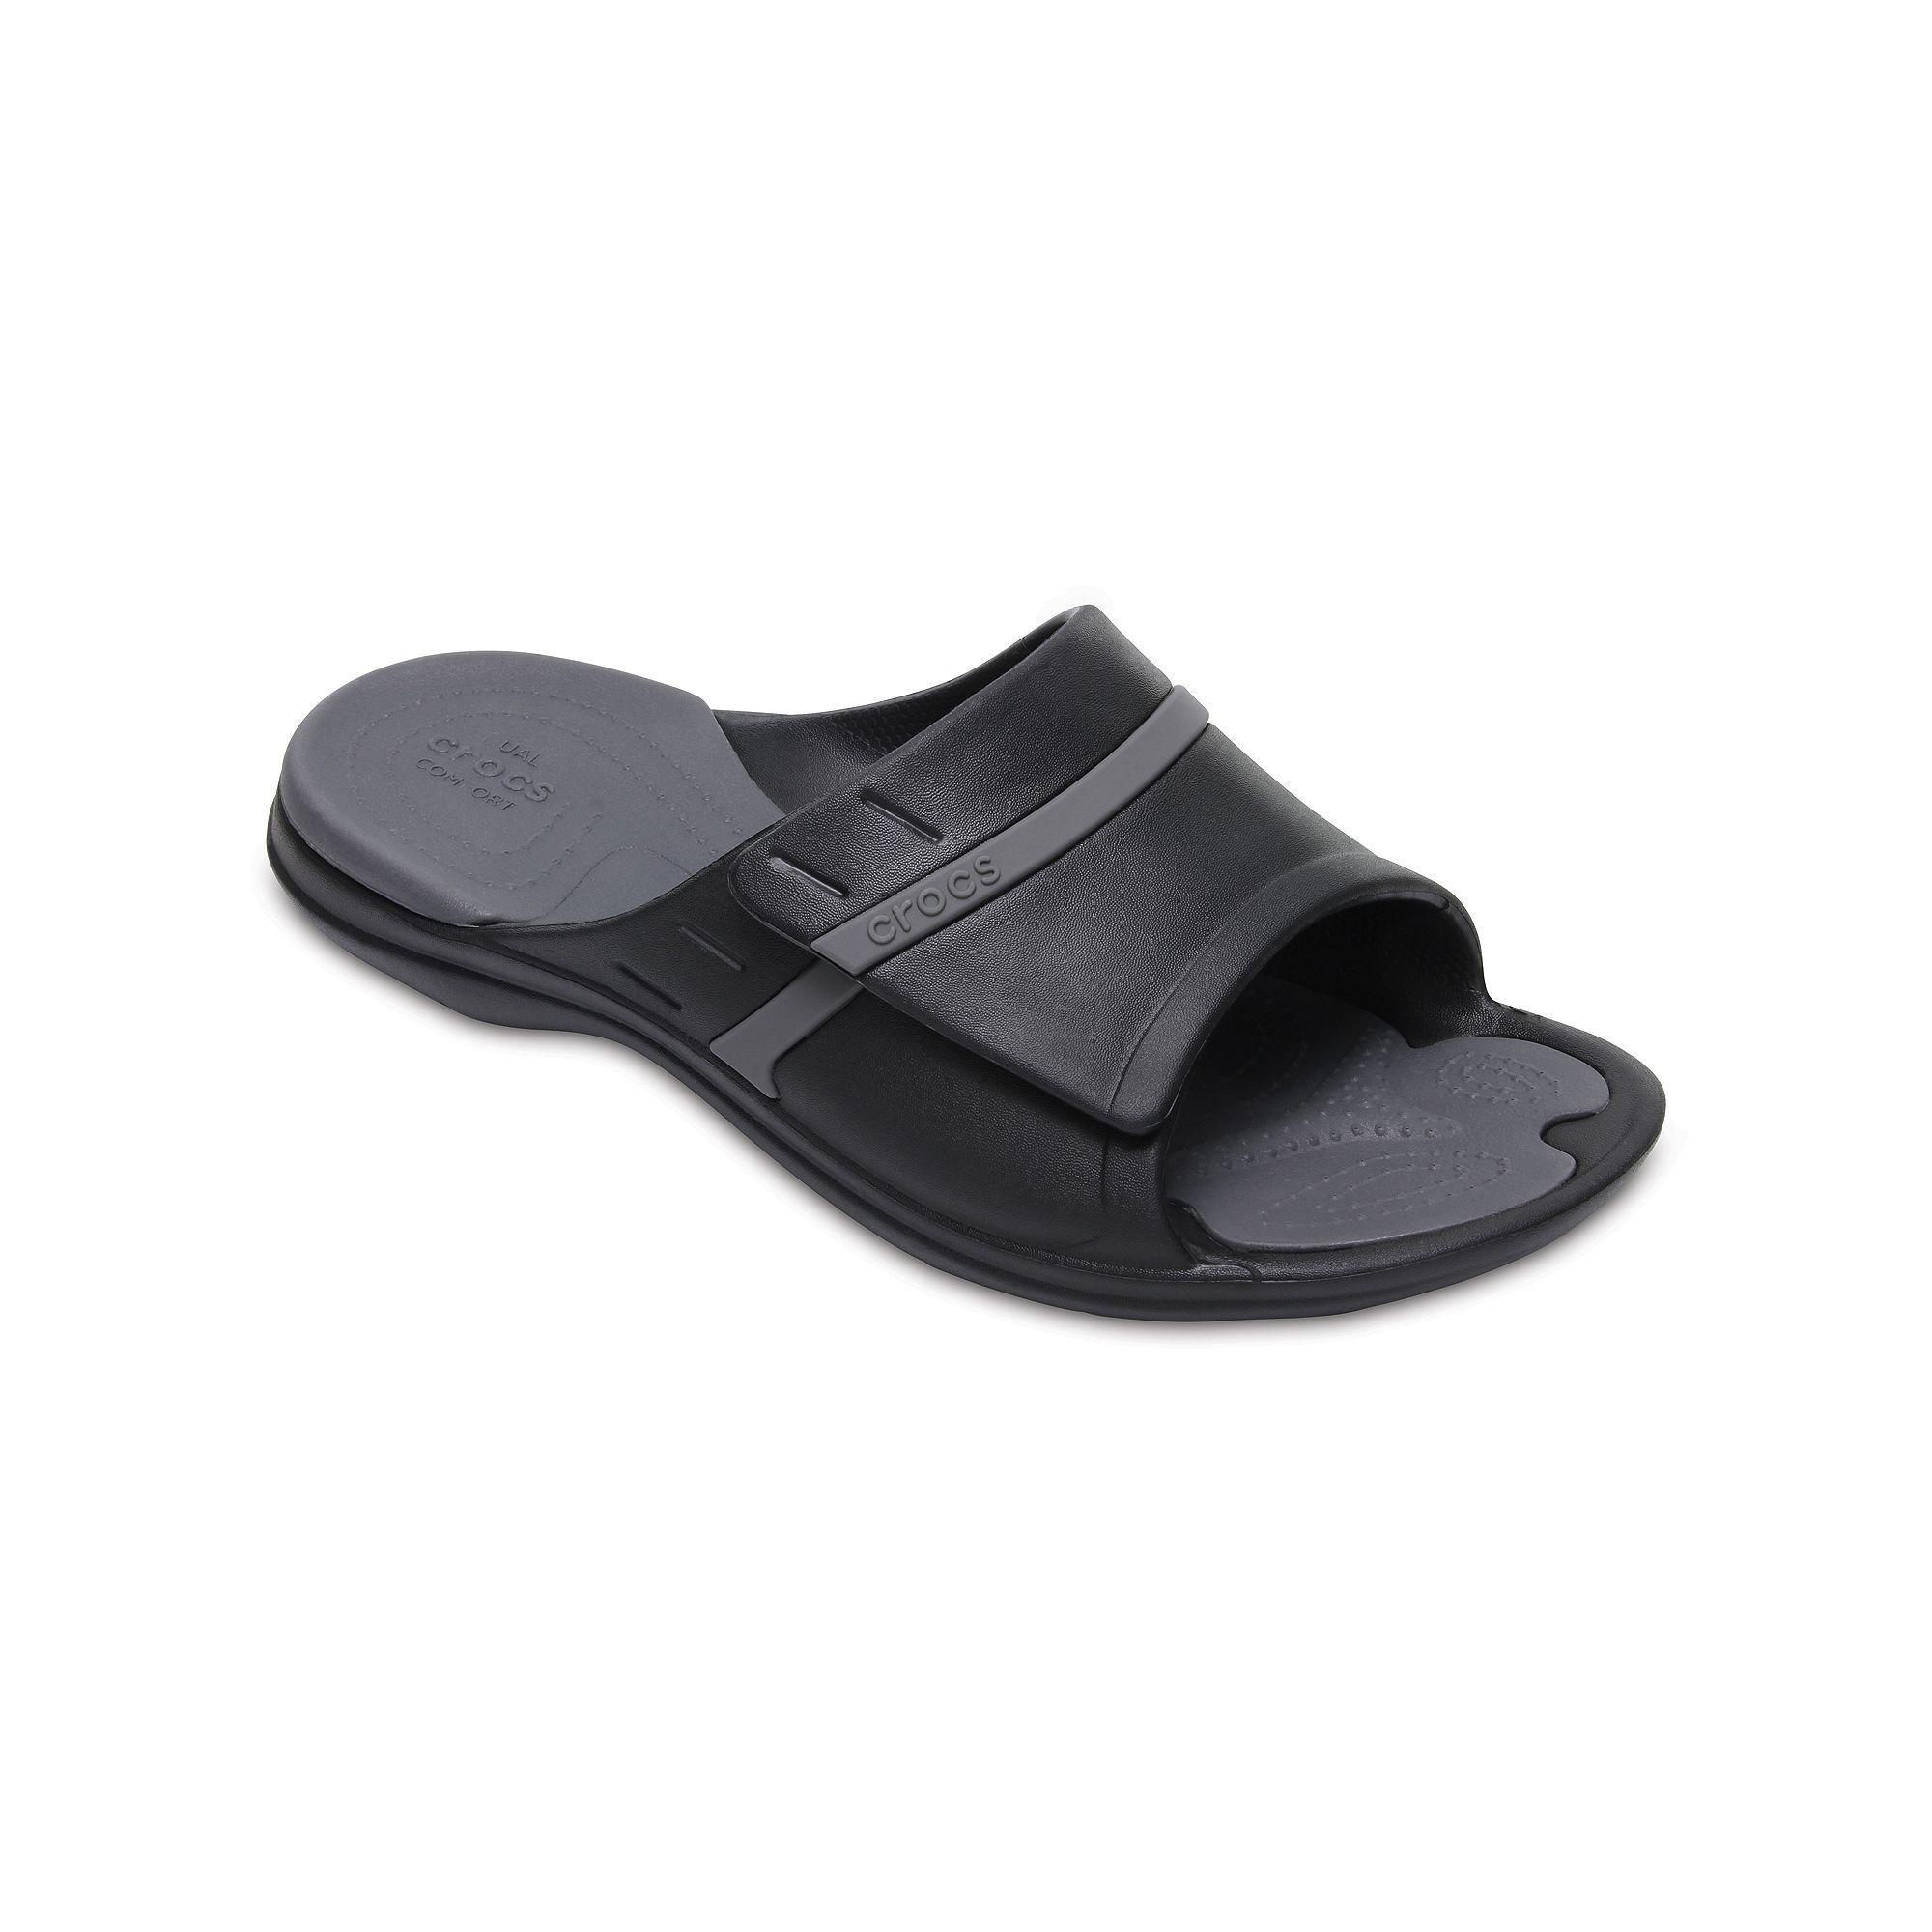 43e0528d39b971 Crocs Modi Sport Men s Slide Sandals